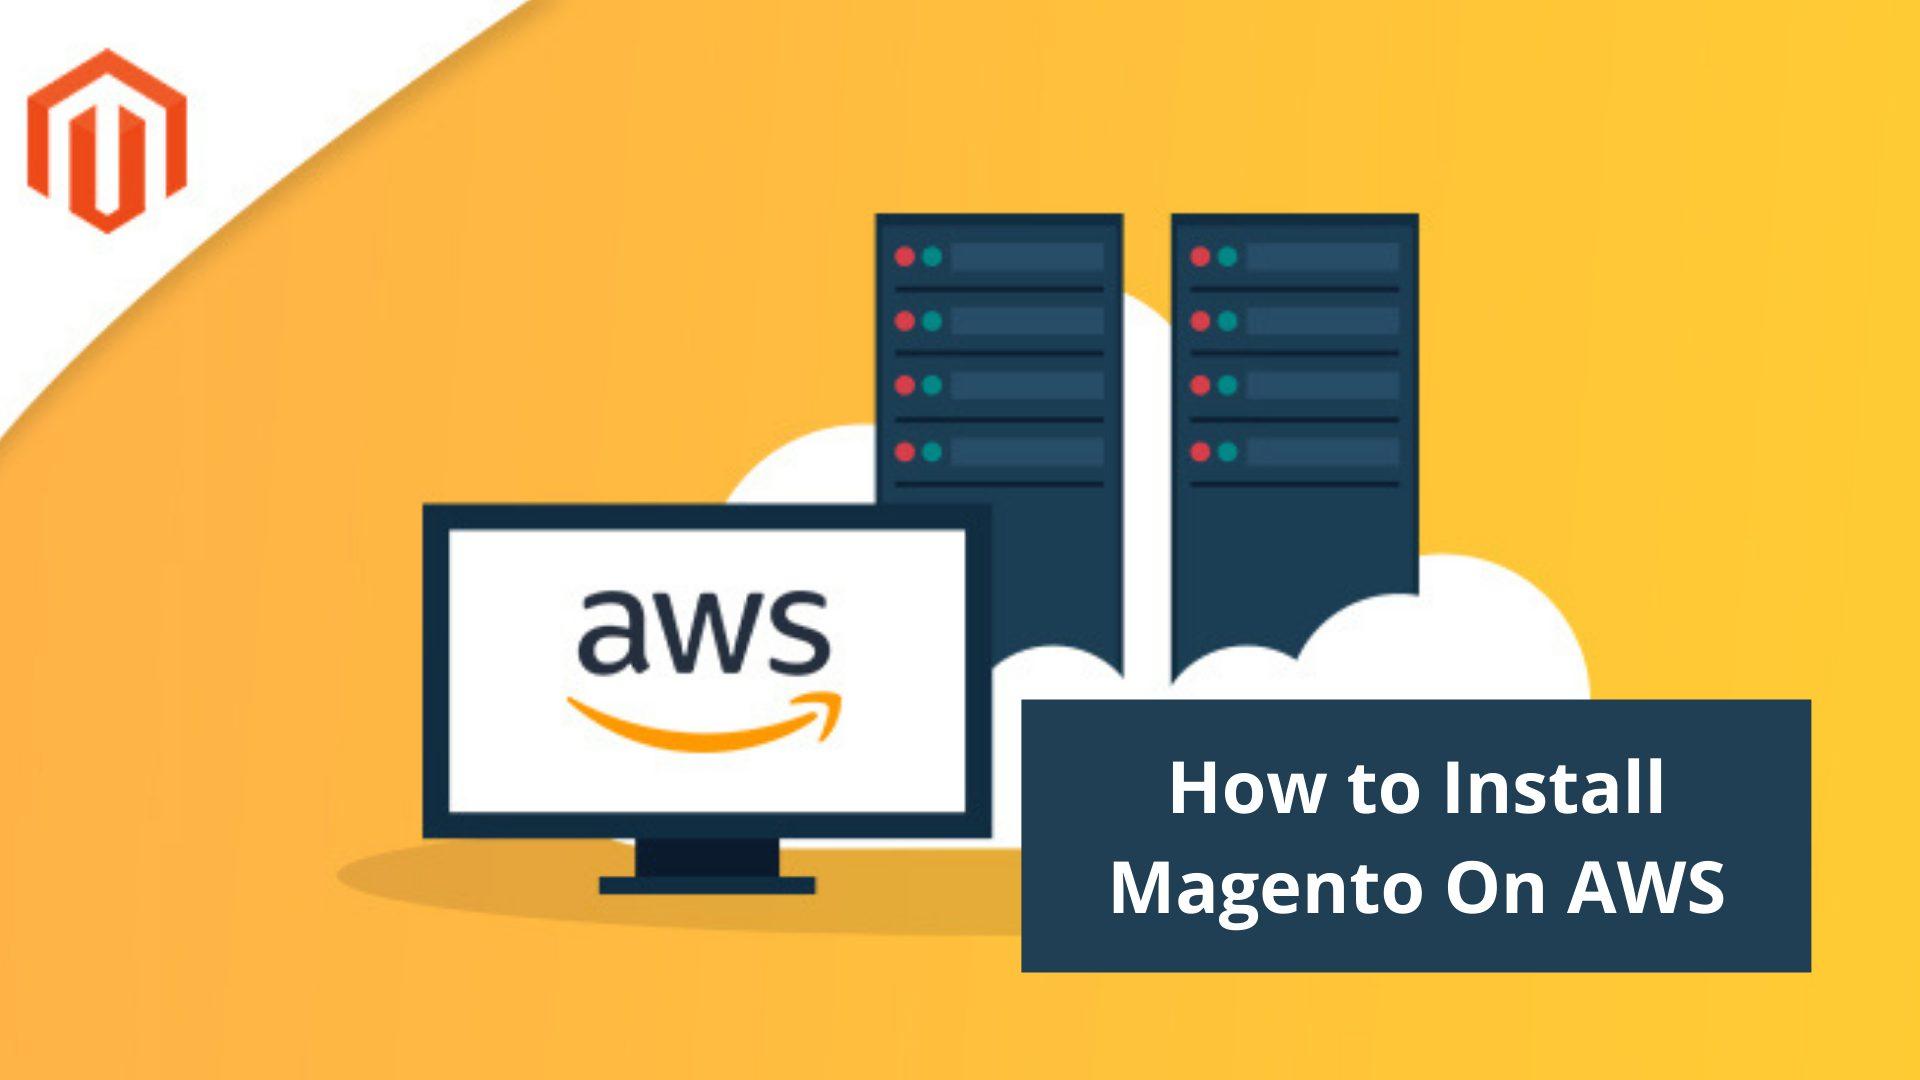 Install Magento On AWS